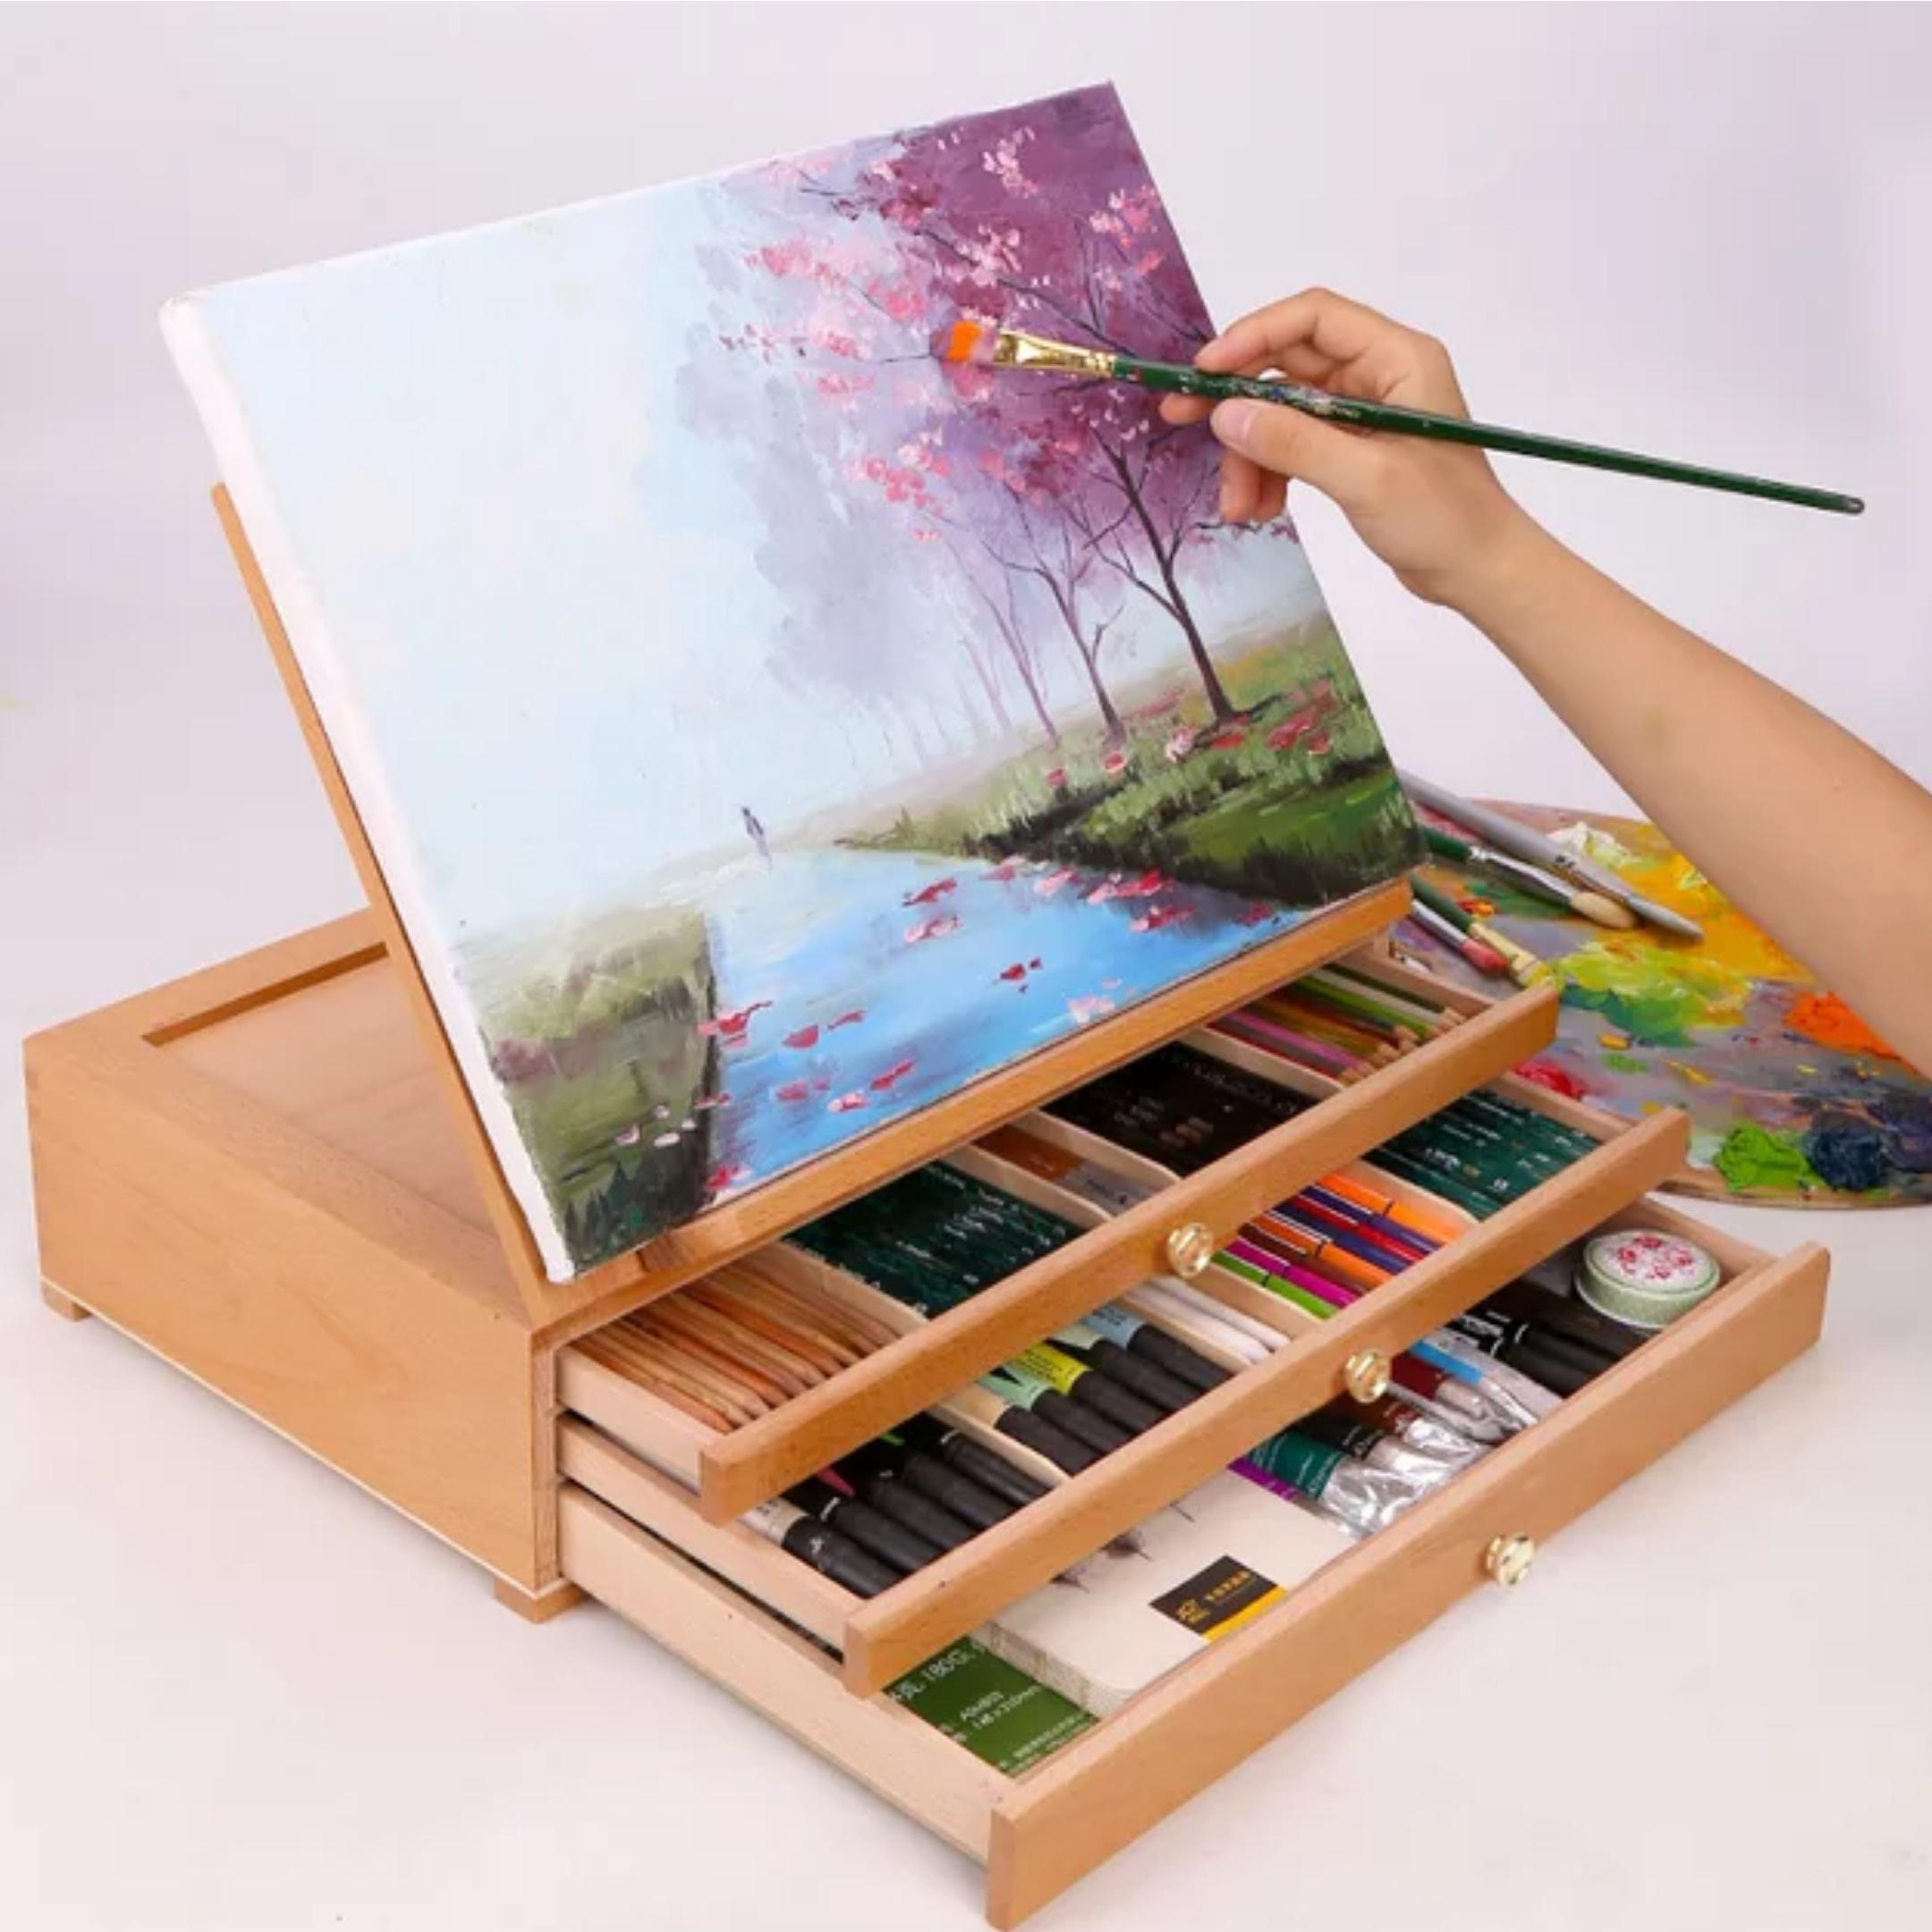 Personal art studio